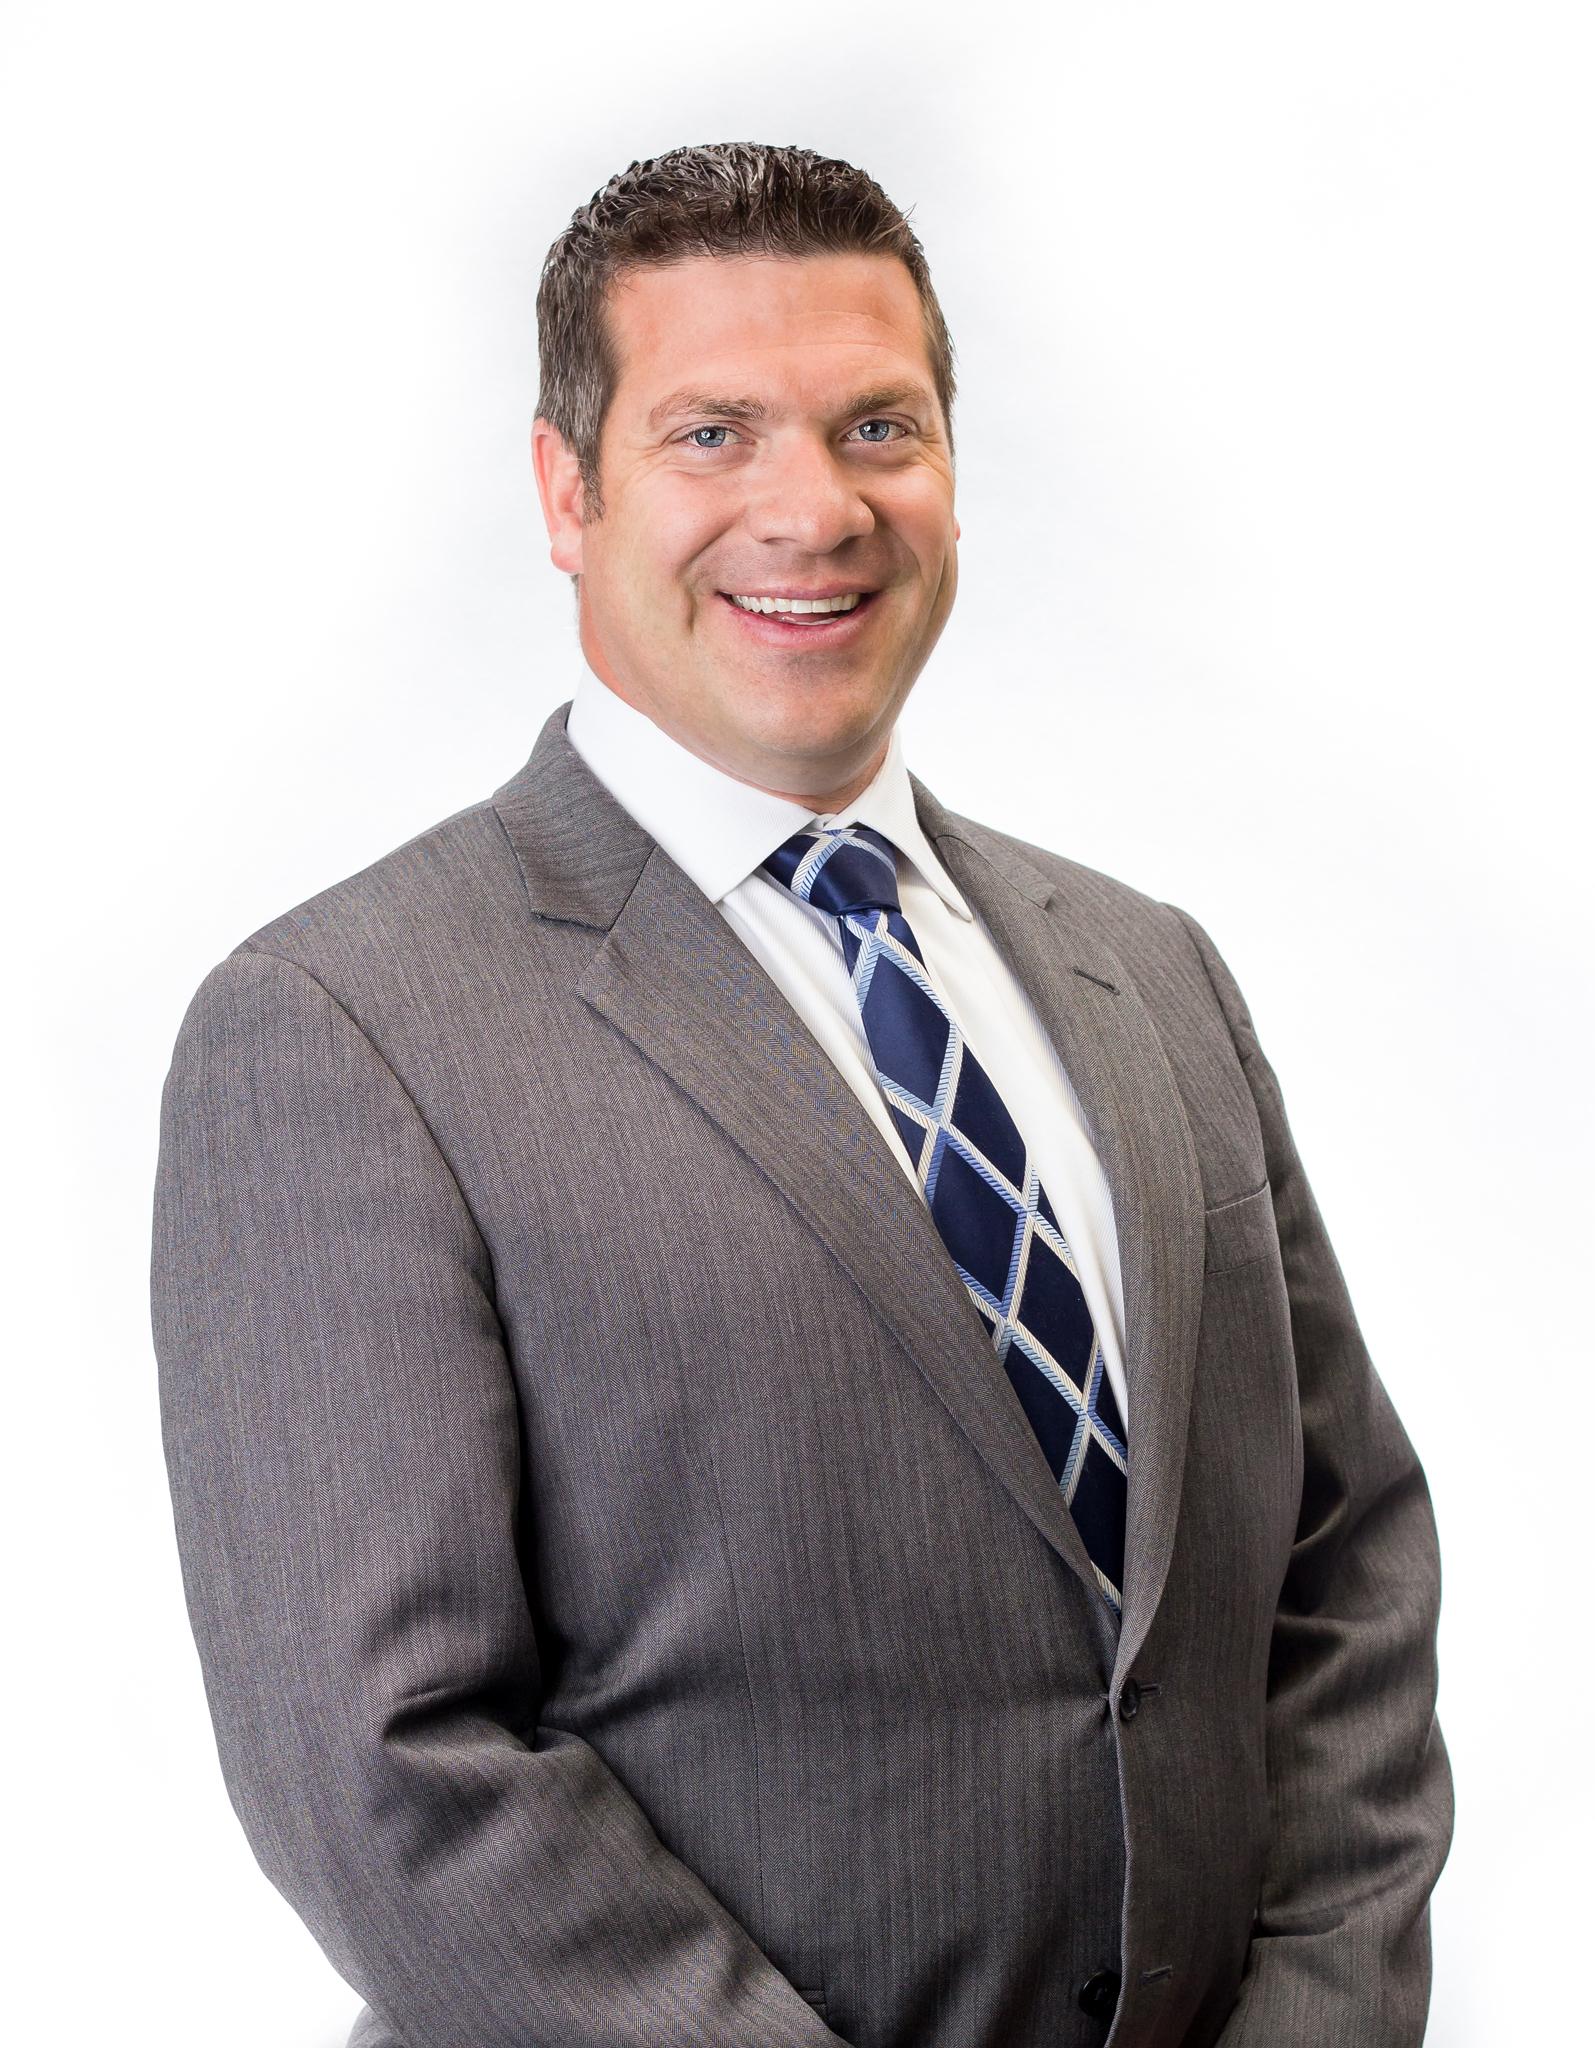 Rich Andrus - Professional Headshot | Tempe, AZ